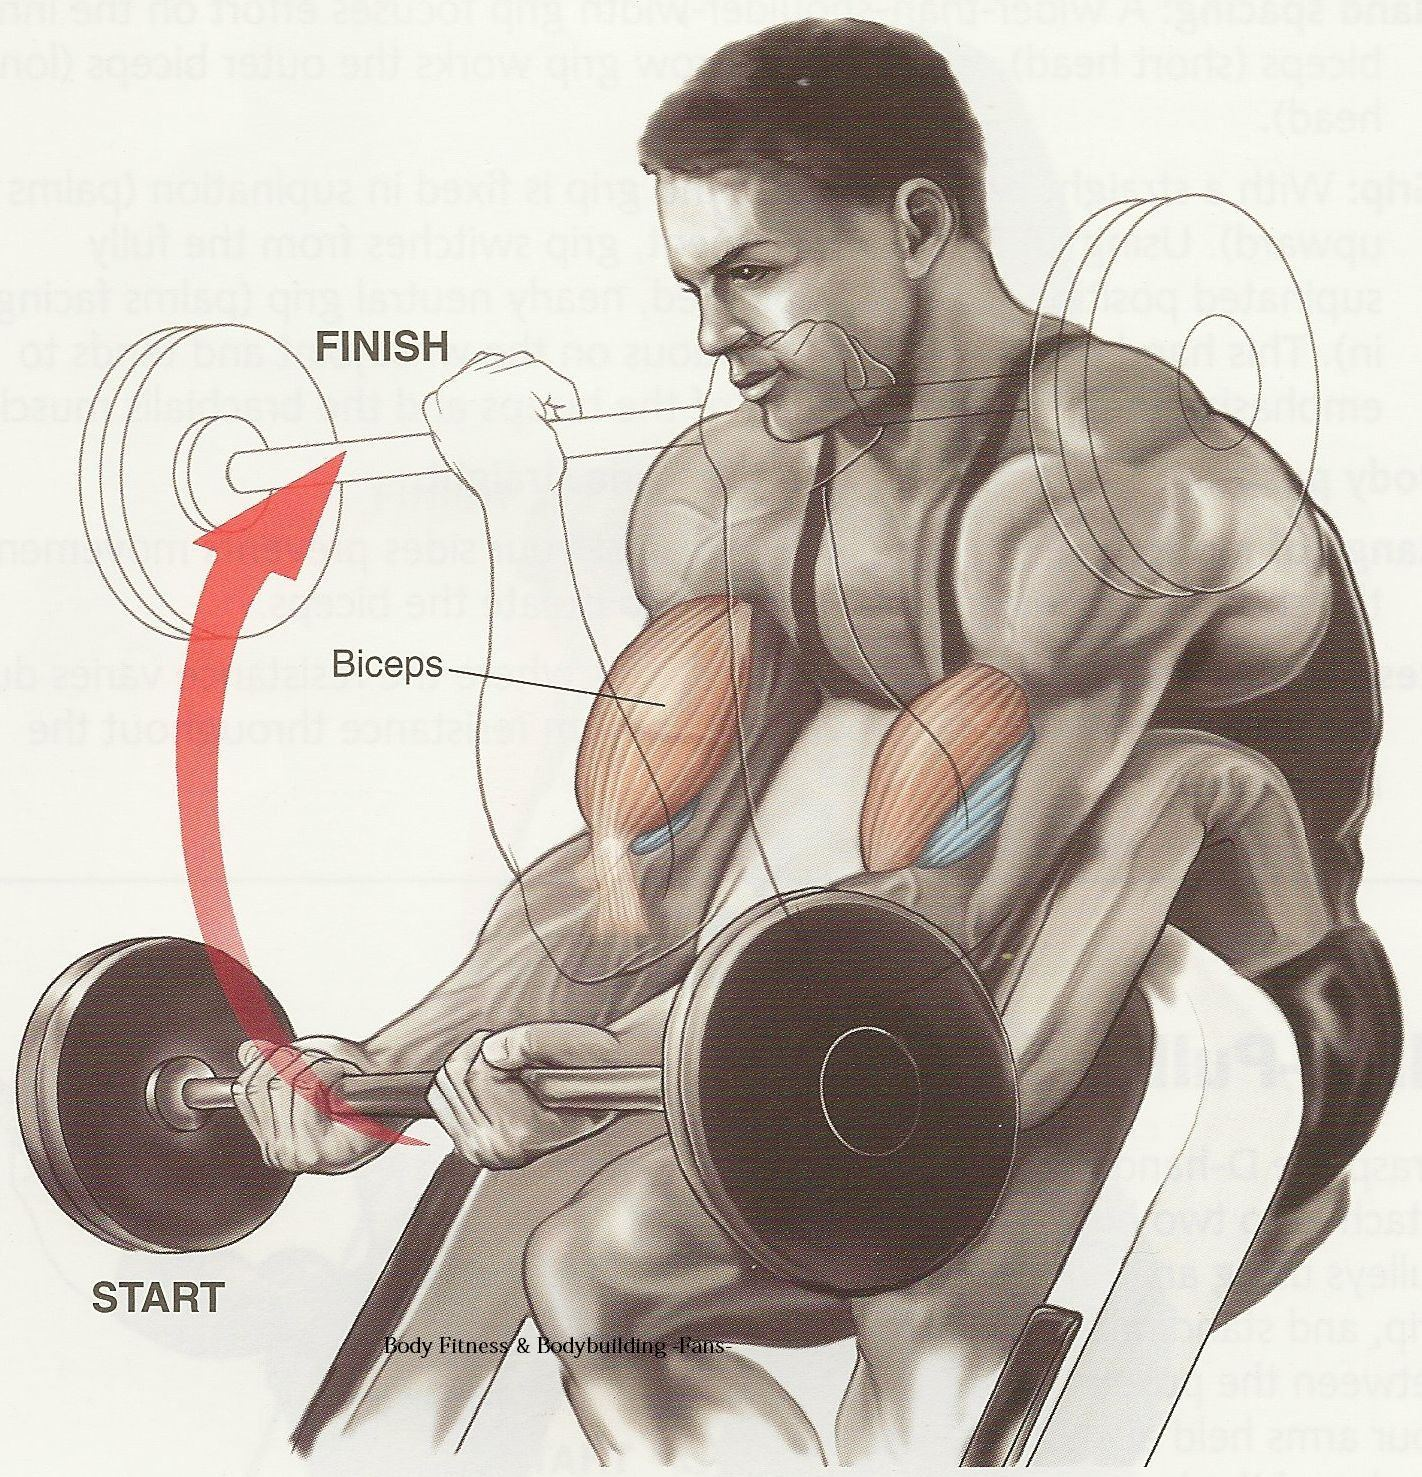 Best Bicep Workout Routine